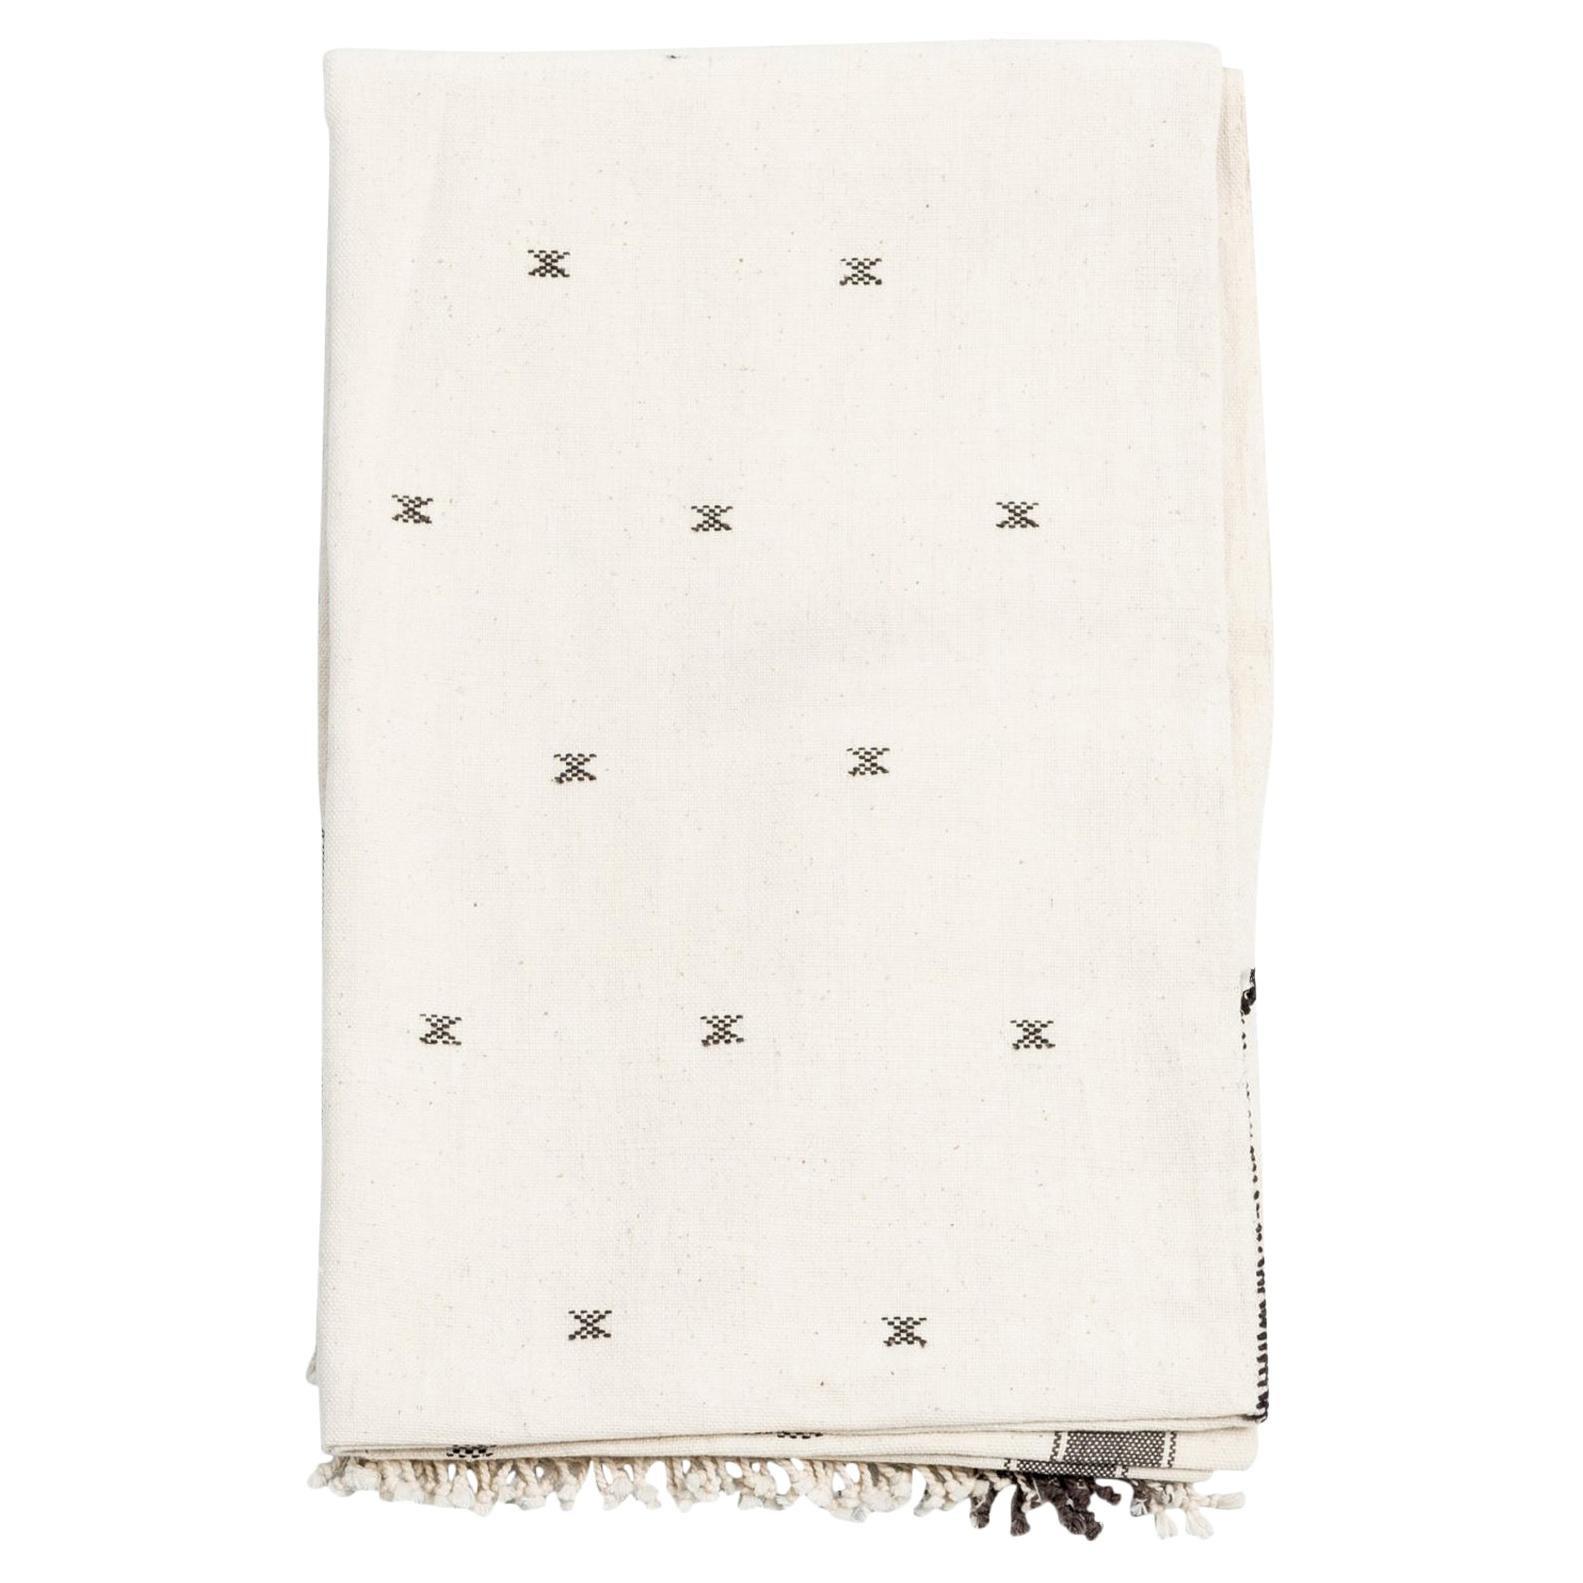 Amro Handloom Queen Size Bedpsread Coverlet Black & White, in Organic Cotton